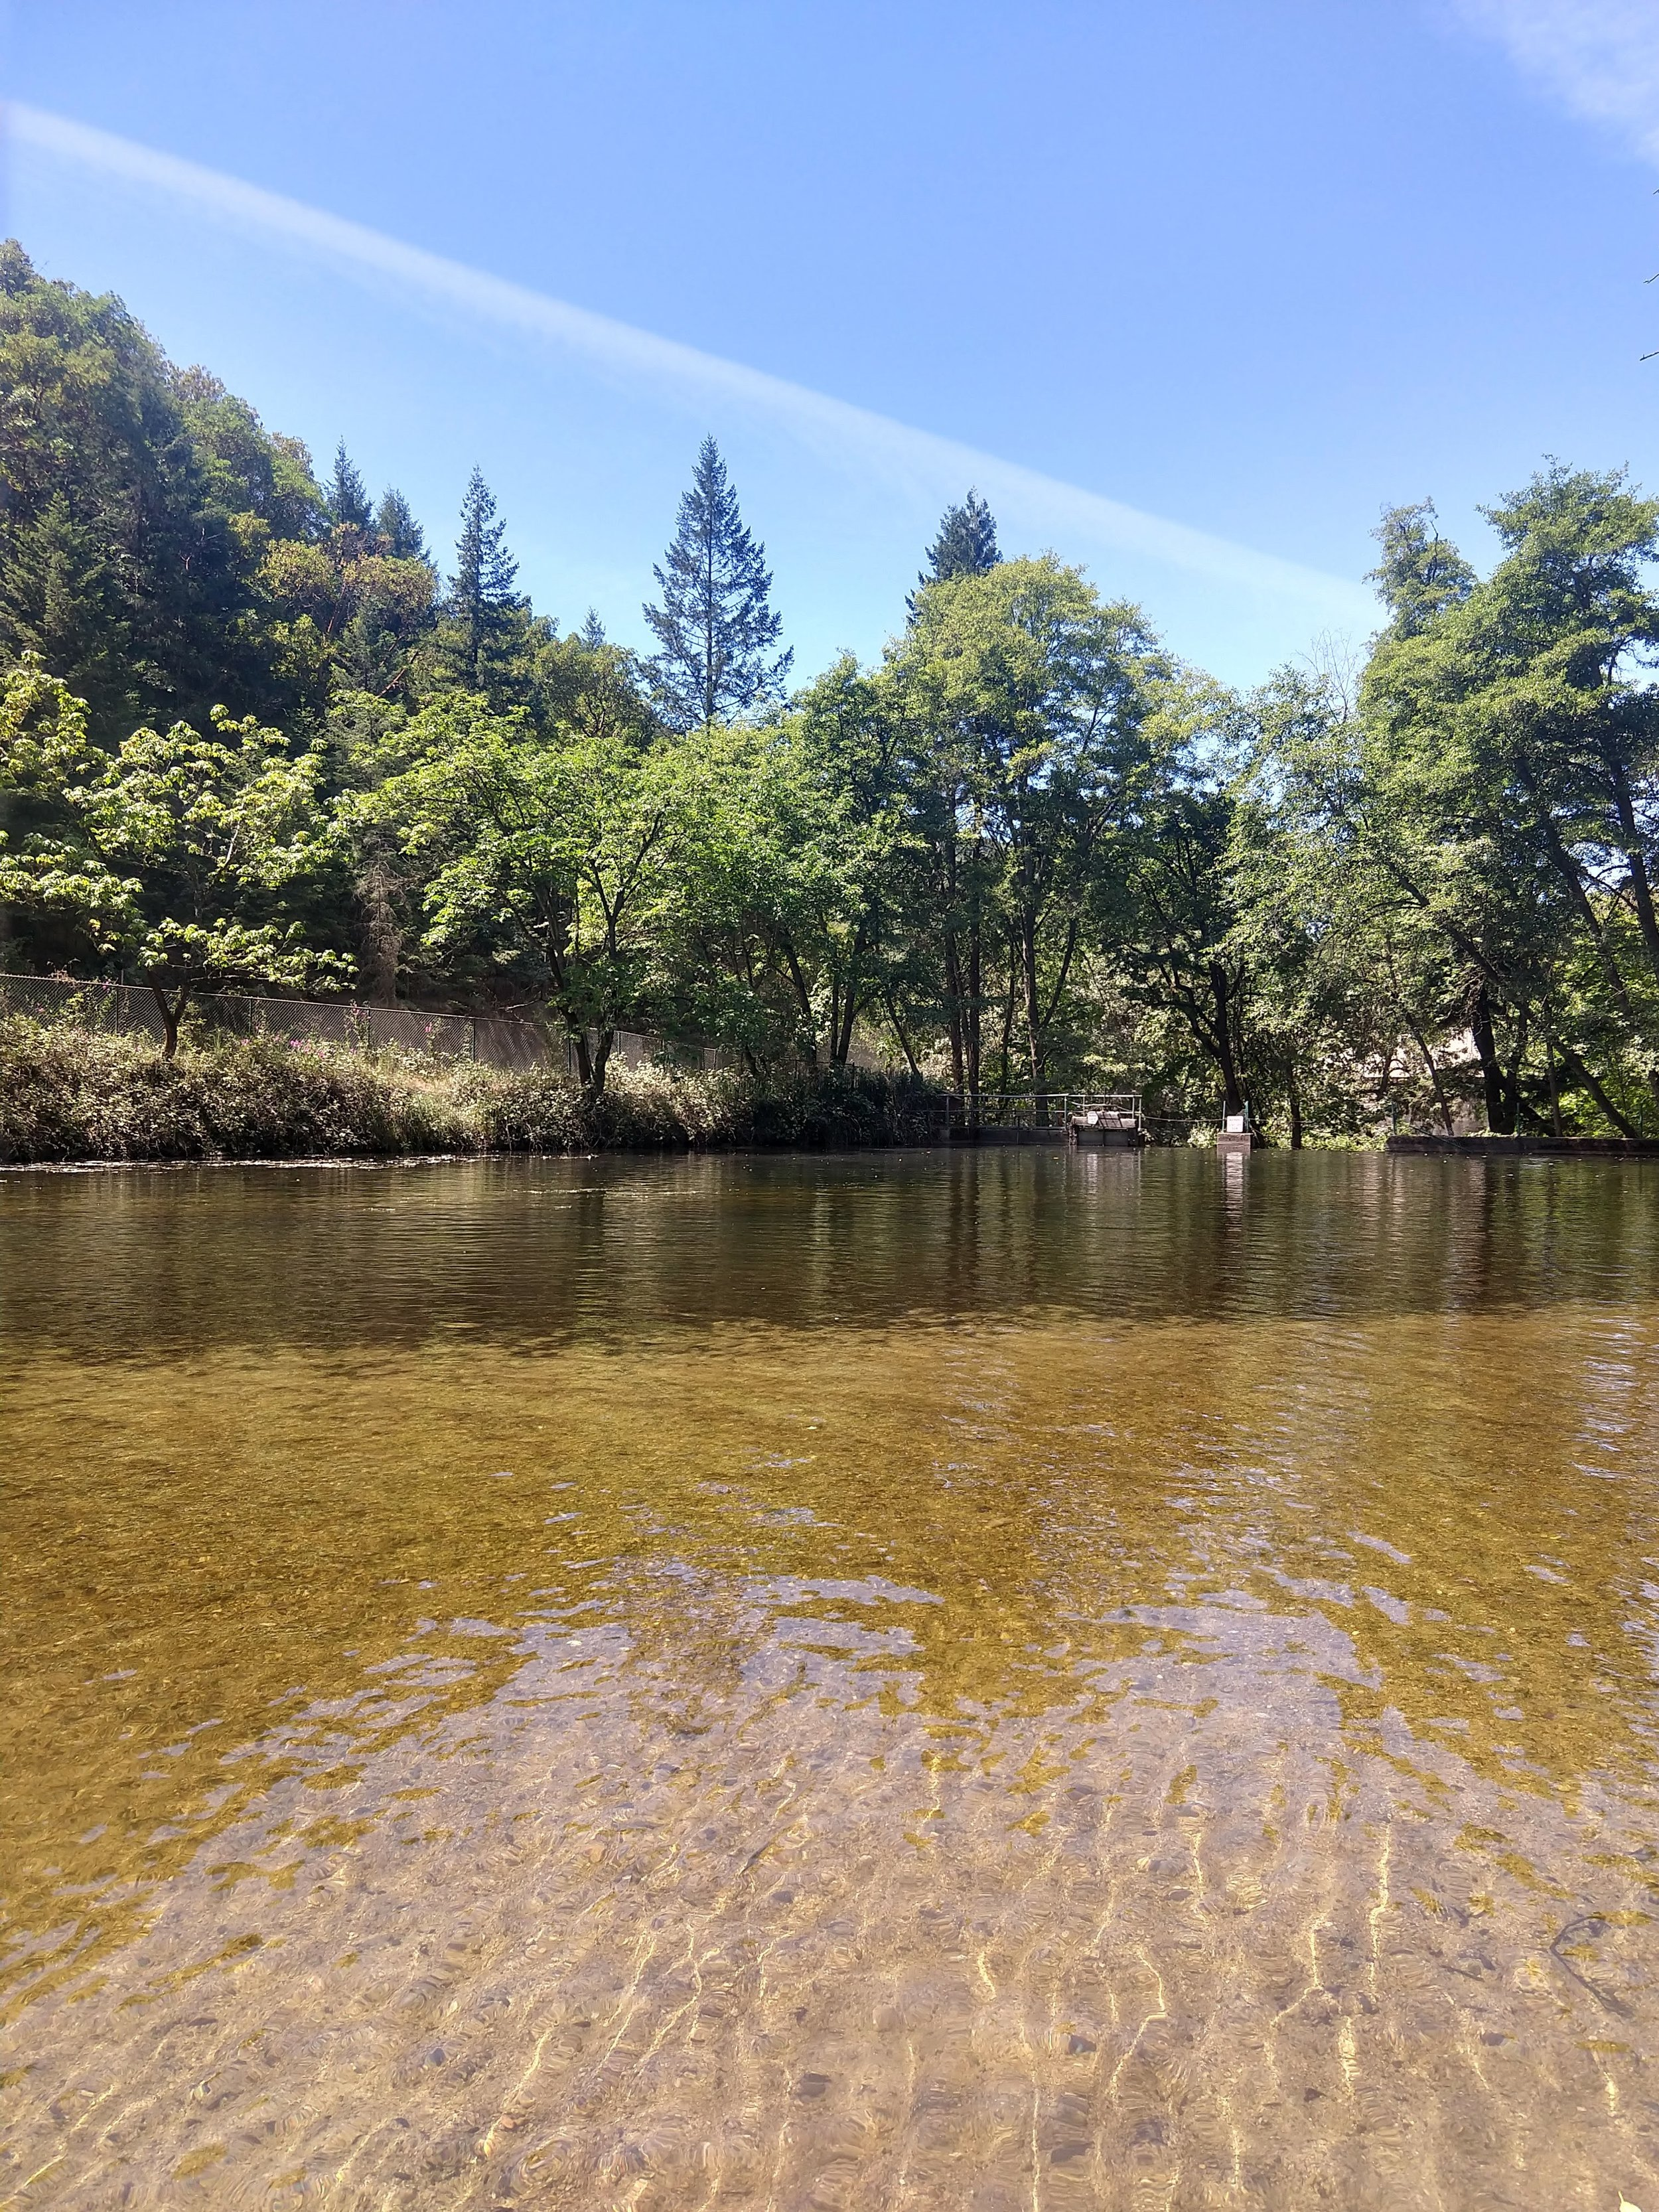 Granite Street Creek Reservoir above Lithia Park in Ashland, Oregon.